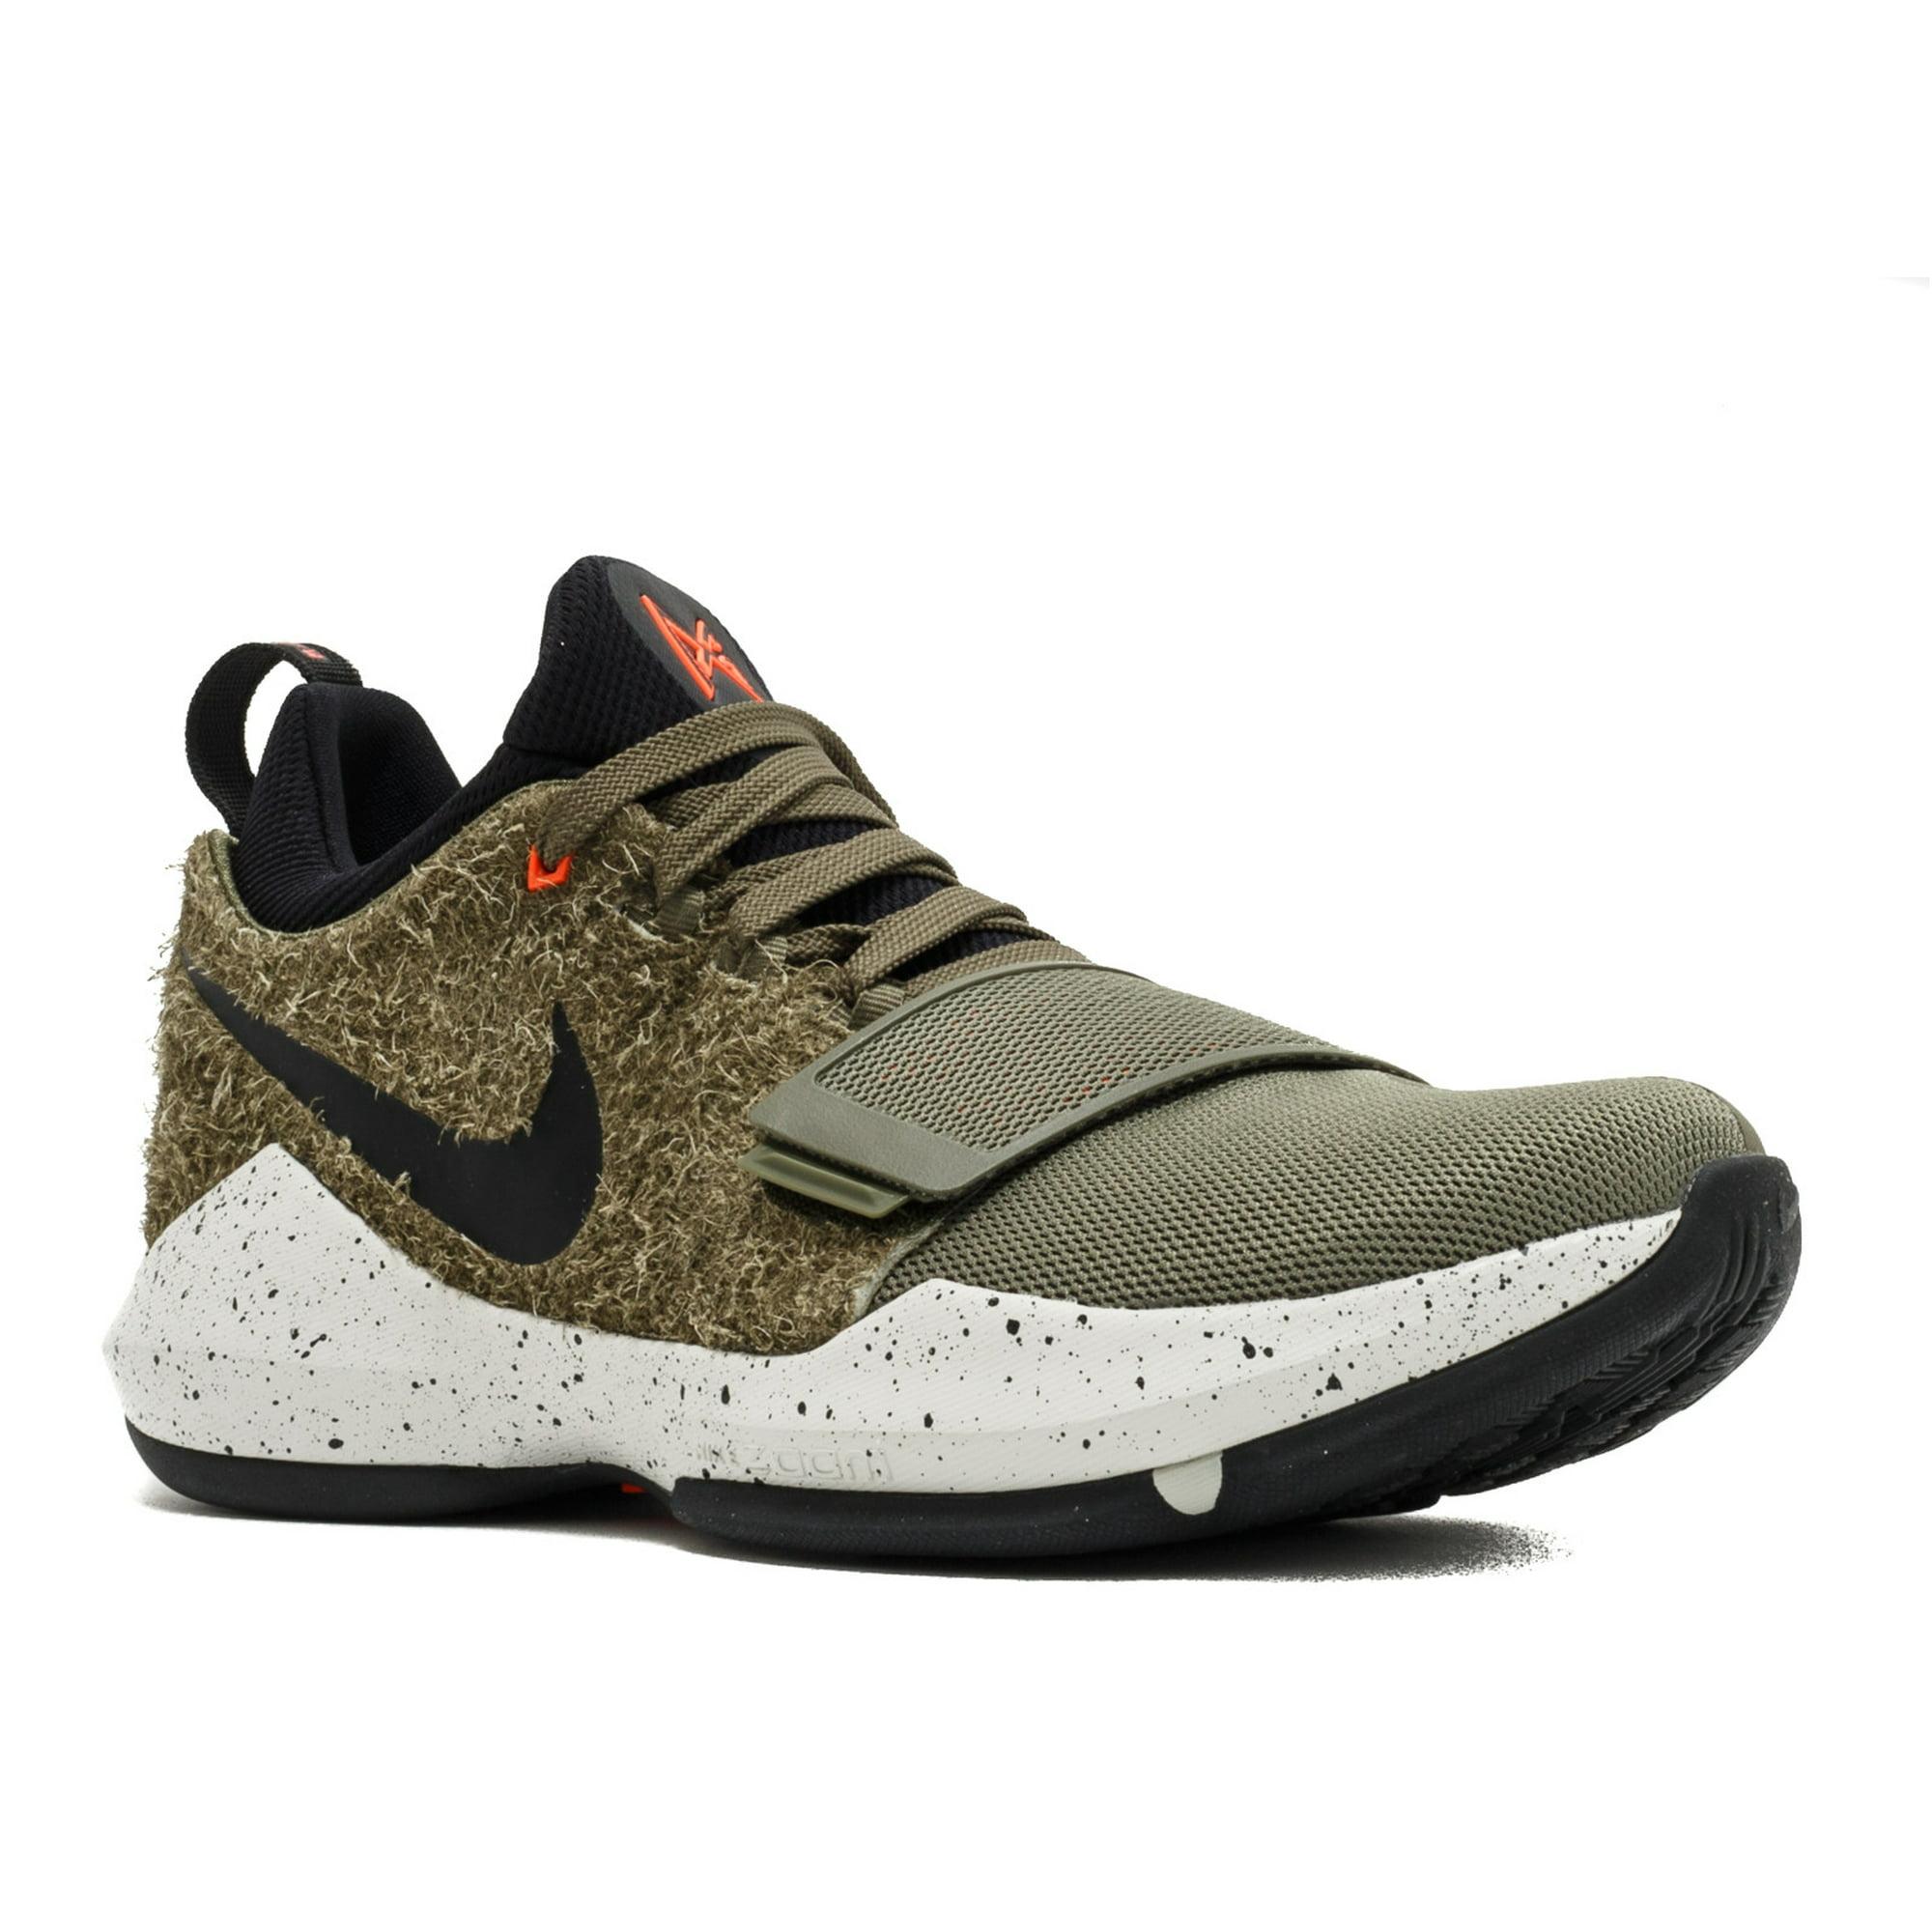 low priced a86fb bd561 Nike - Men - Pg 1 Elements - 911085-200 - Size 9